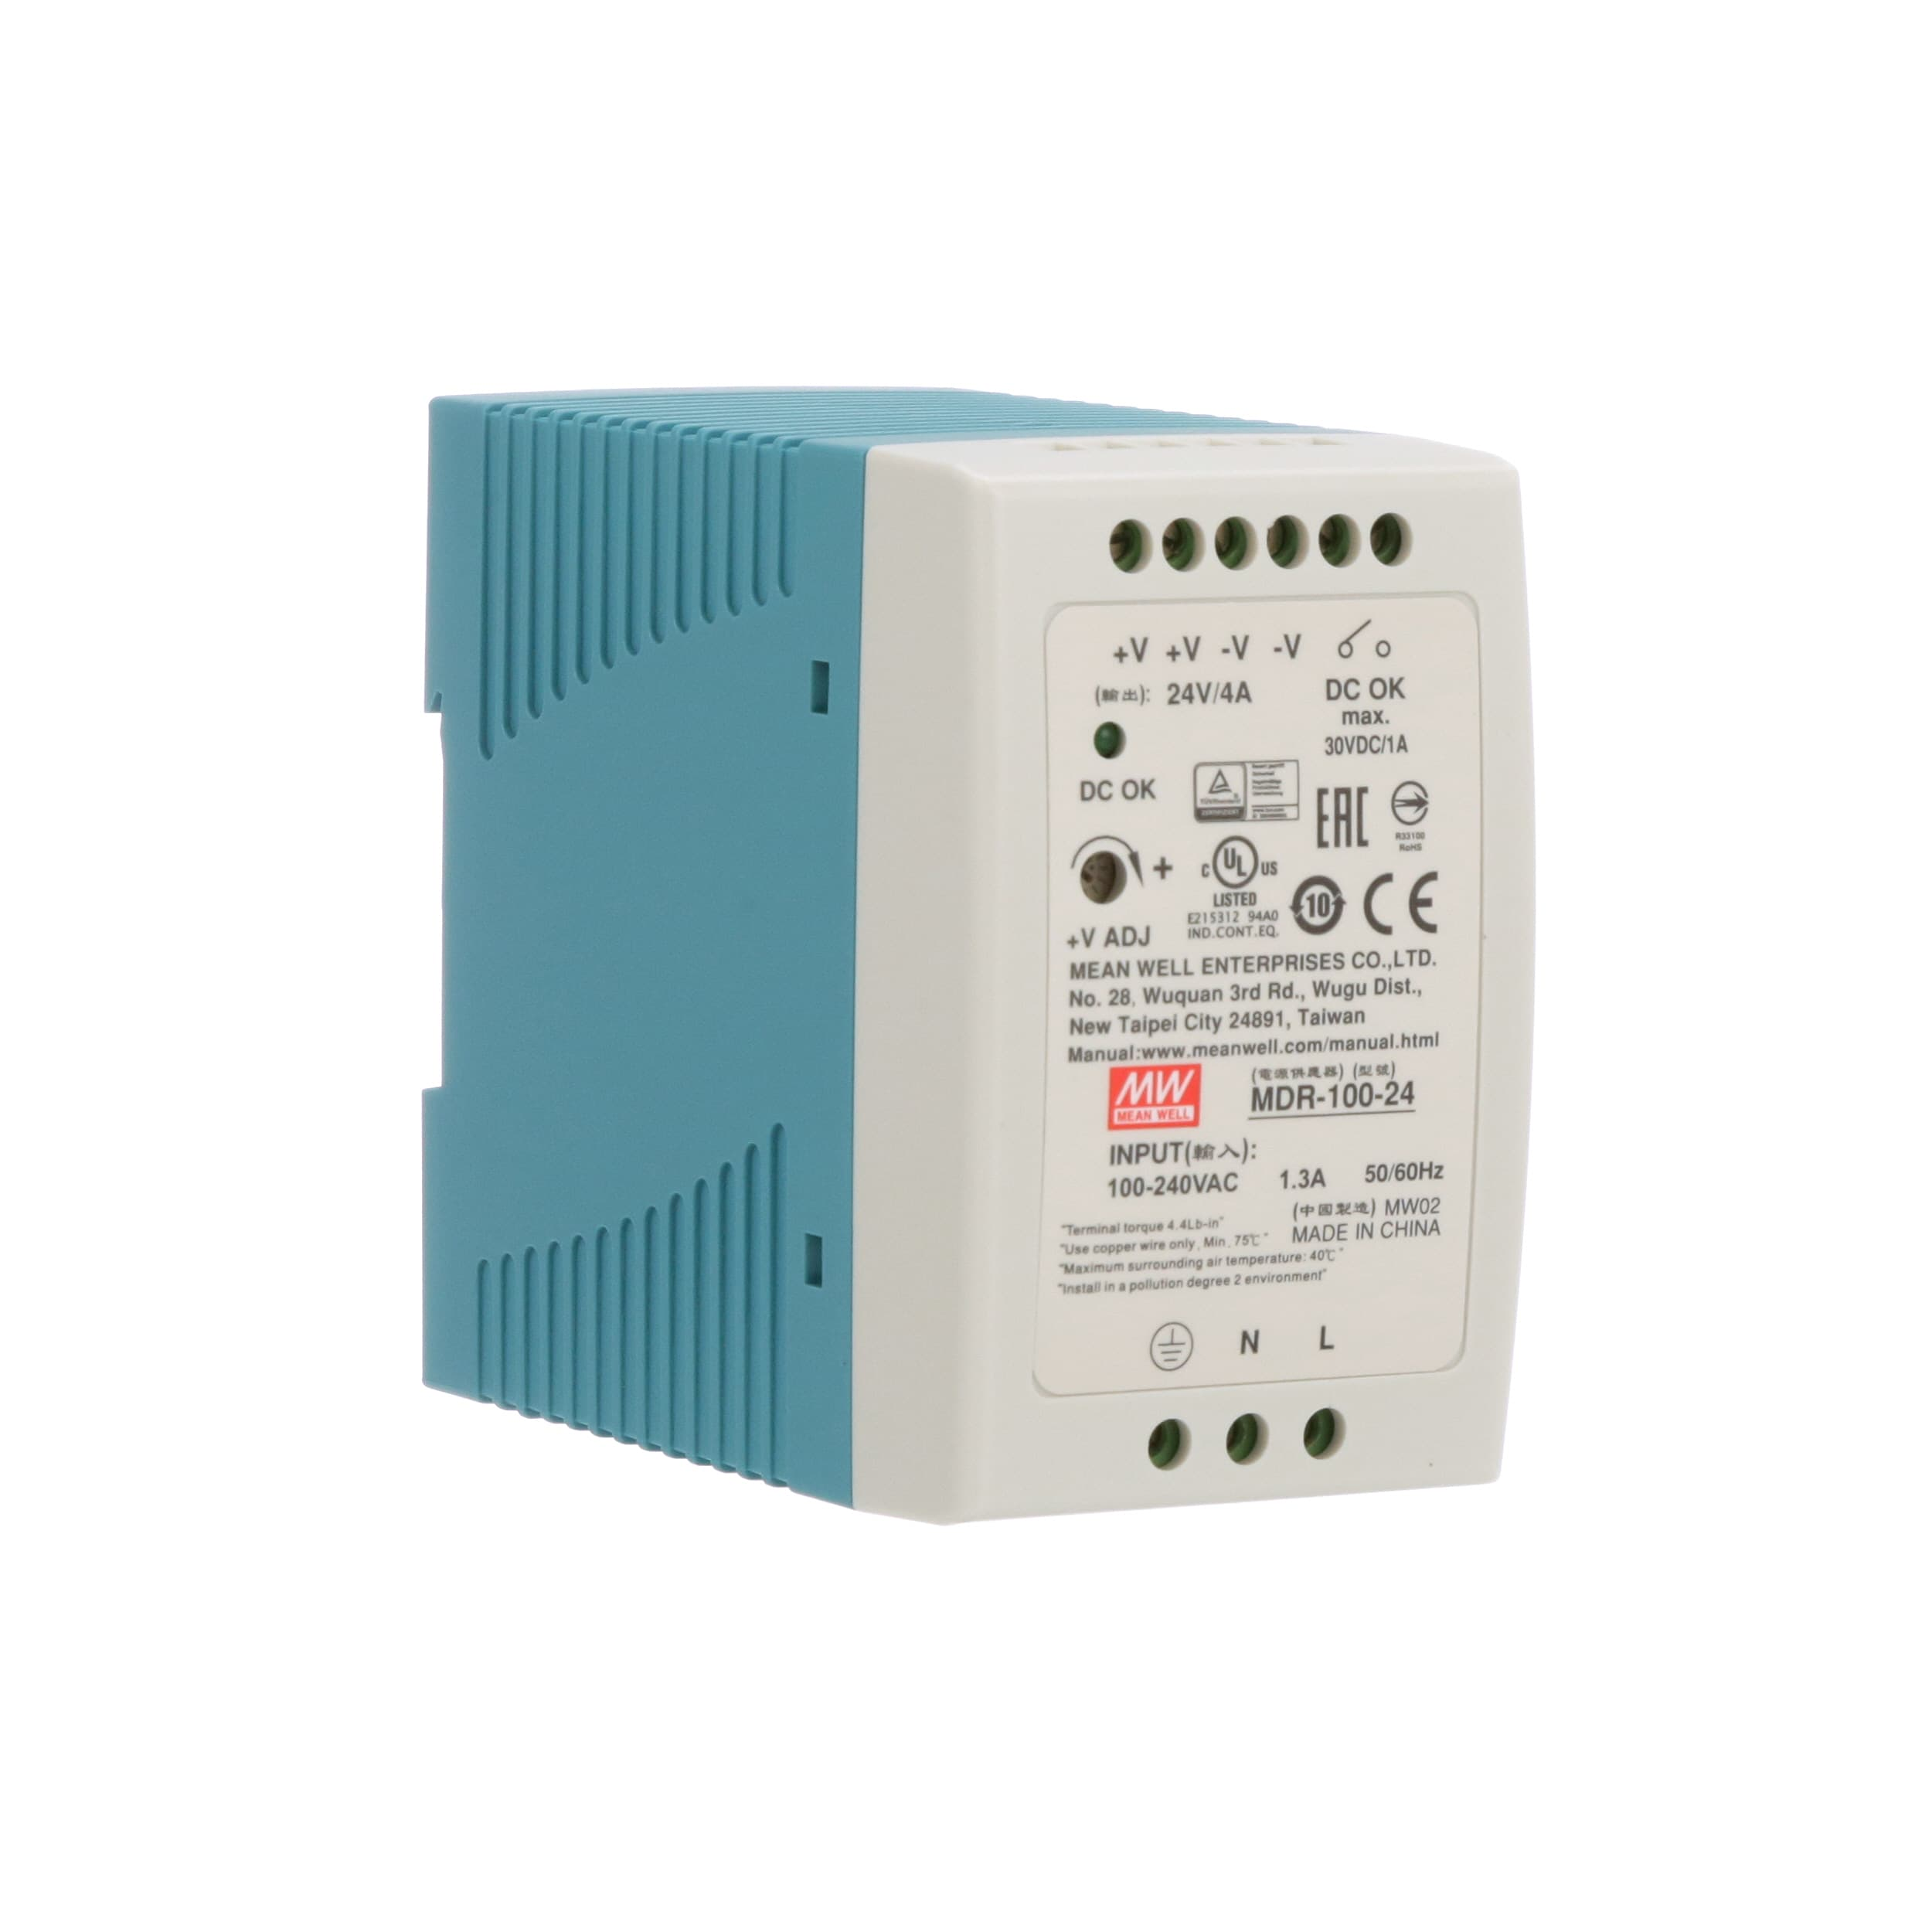 Mean Well USA - MDR-100-24 - Power Supply; AC-DC; 24V; 4A; 100-264V ...